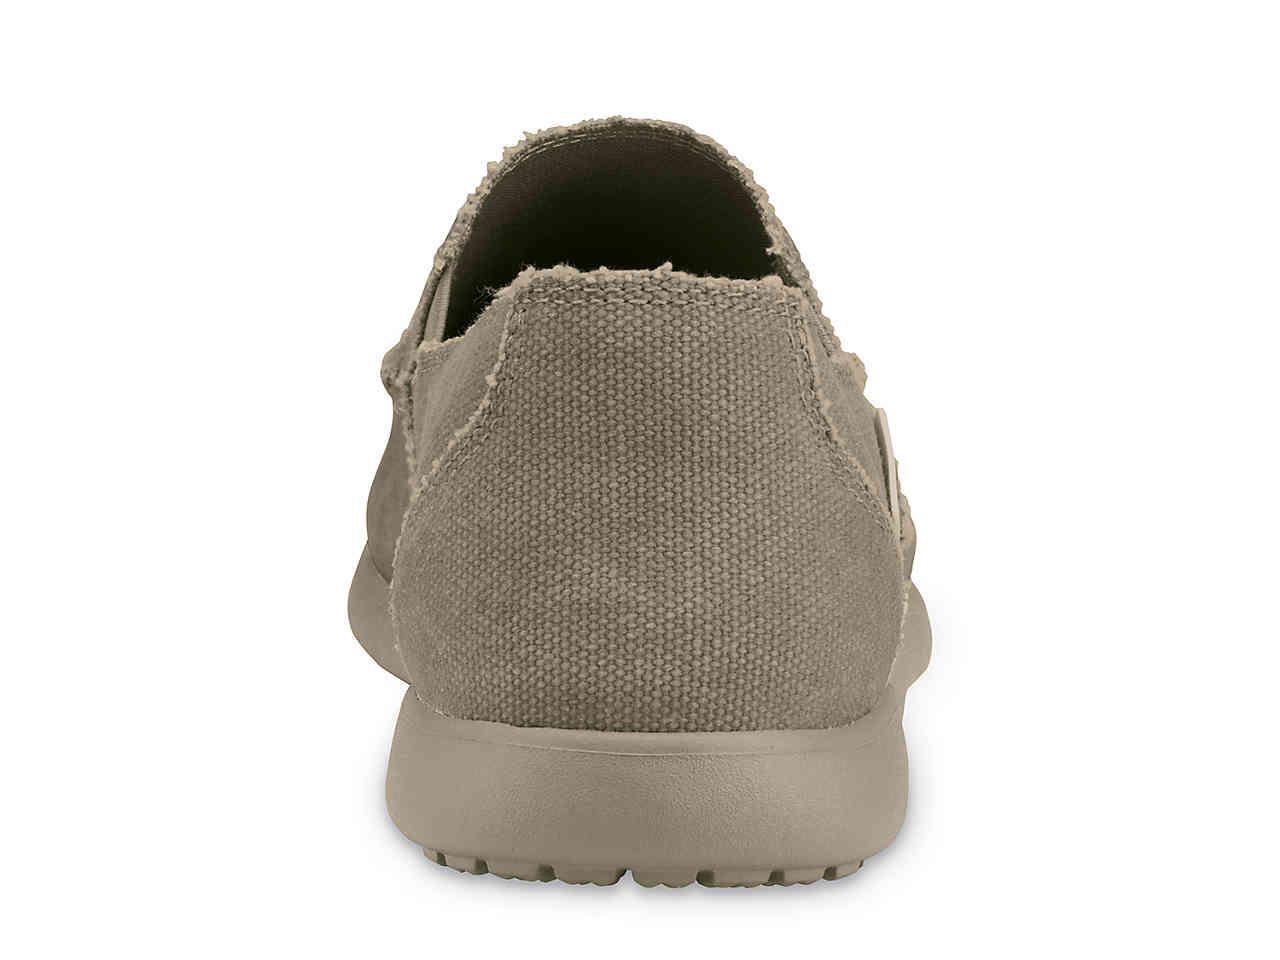 2c81730cf0 Lyst - Crocs™ Santa Cruz Slip-on for Men - Save 31%